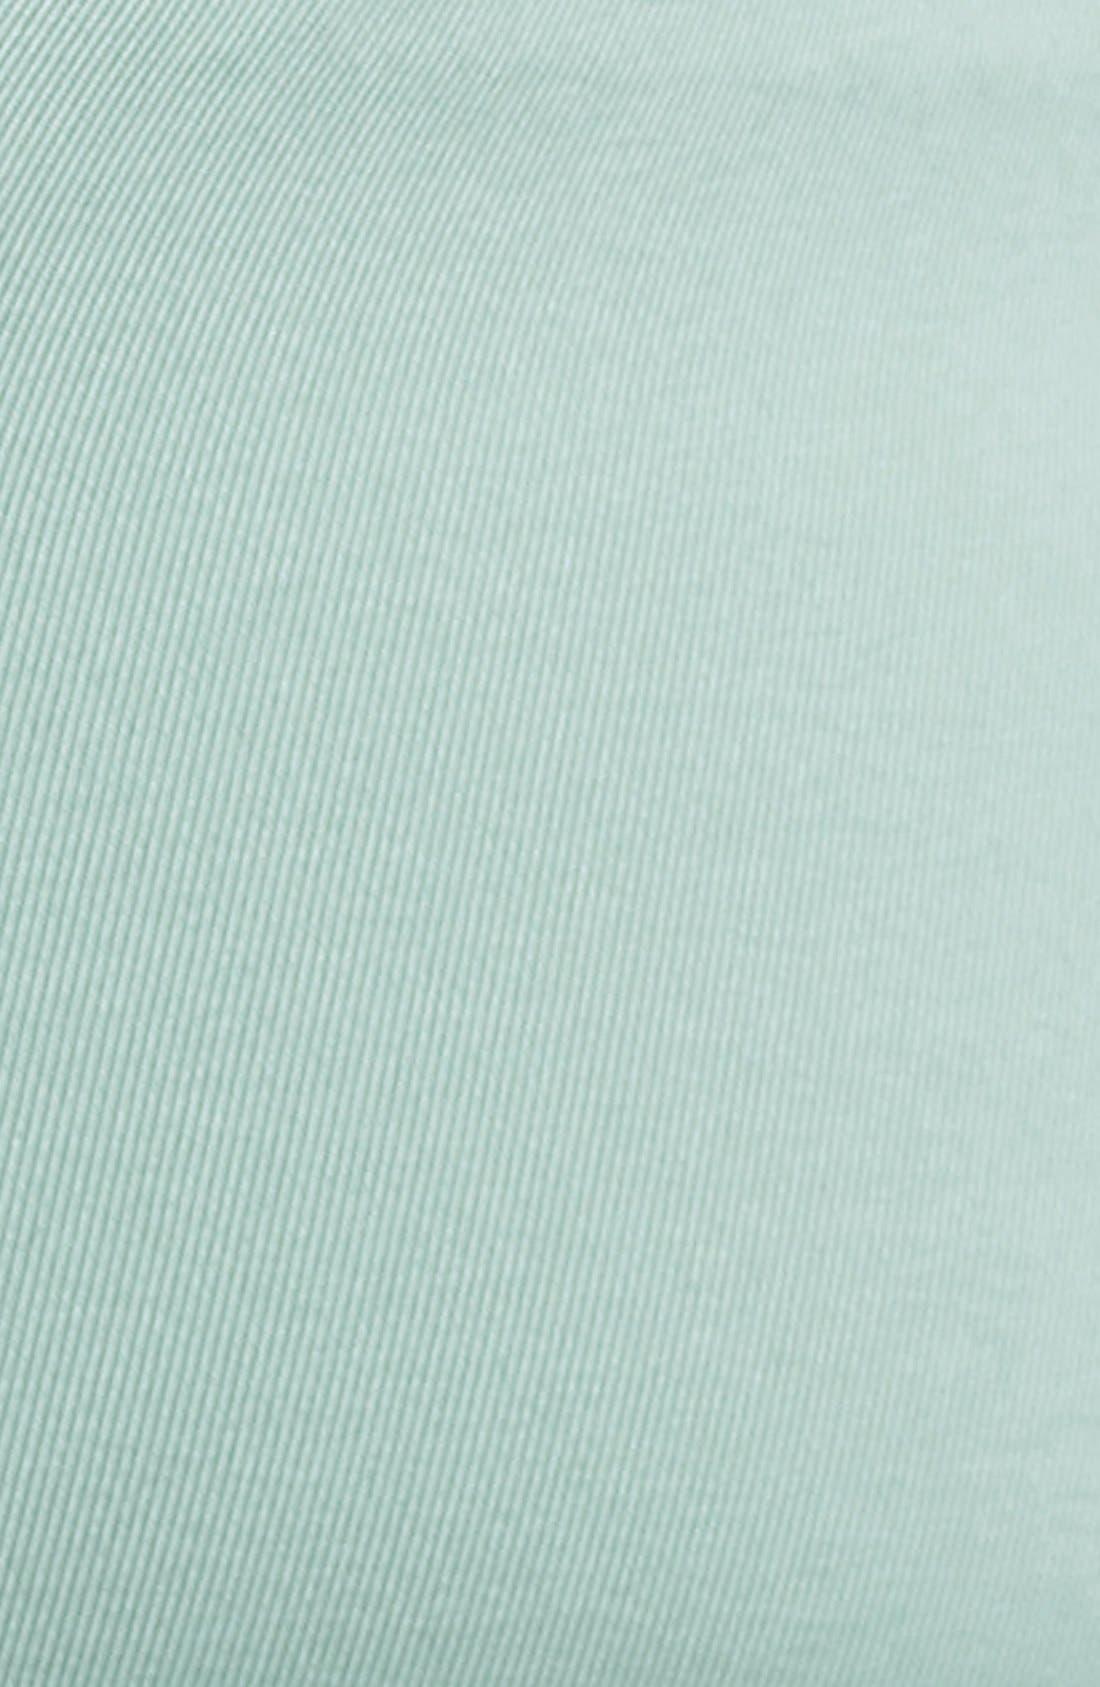 'Seductive Comfort - Customized Lift' Underwire Bra,                             Alternate thumbnail 78, color,